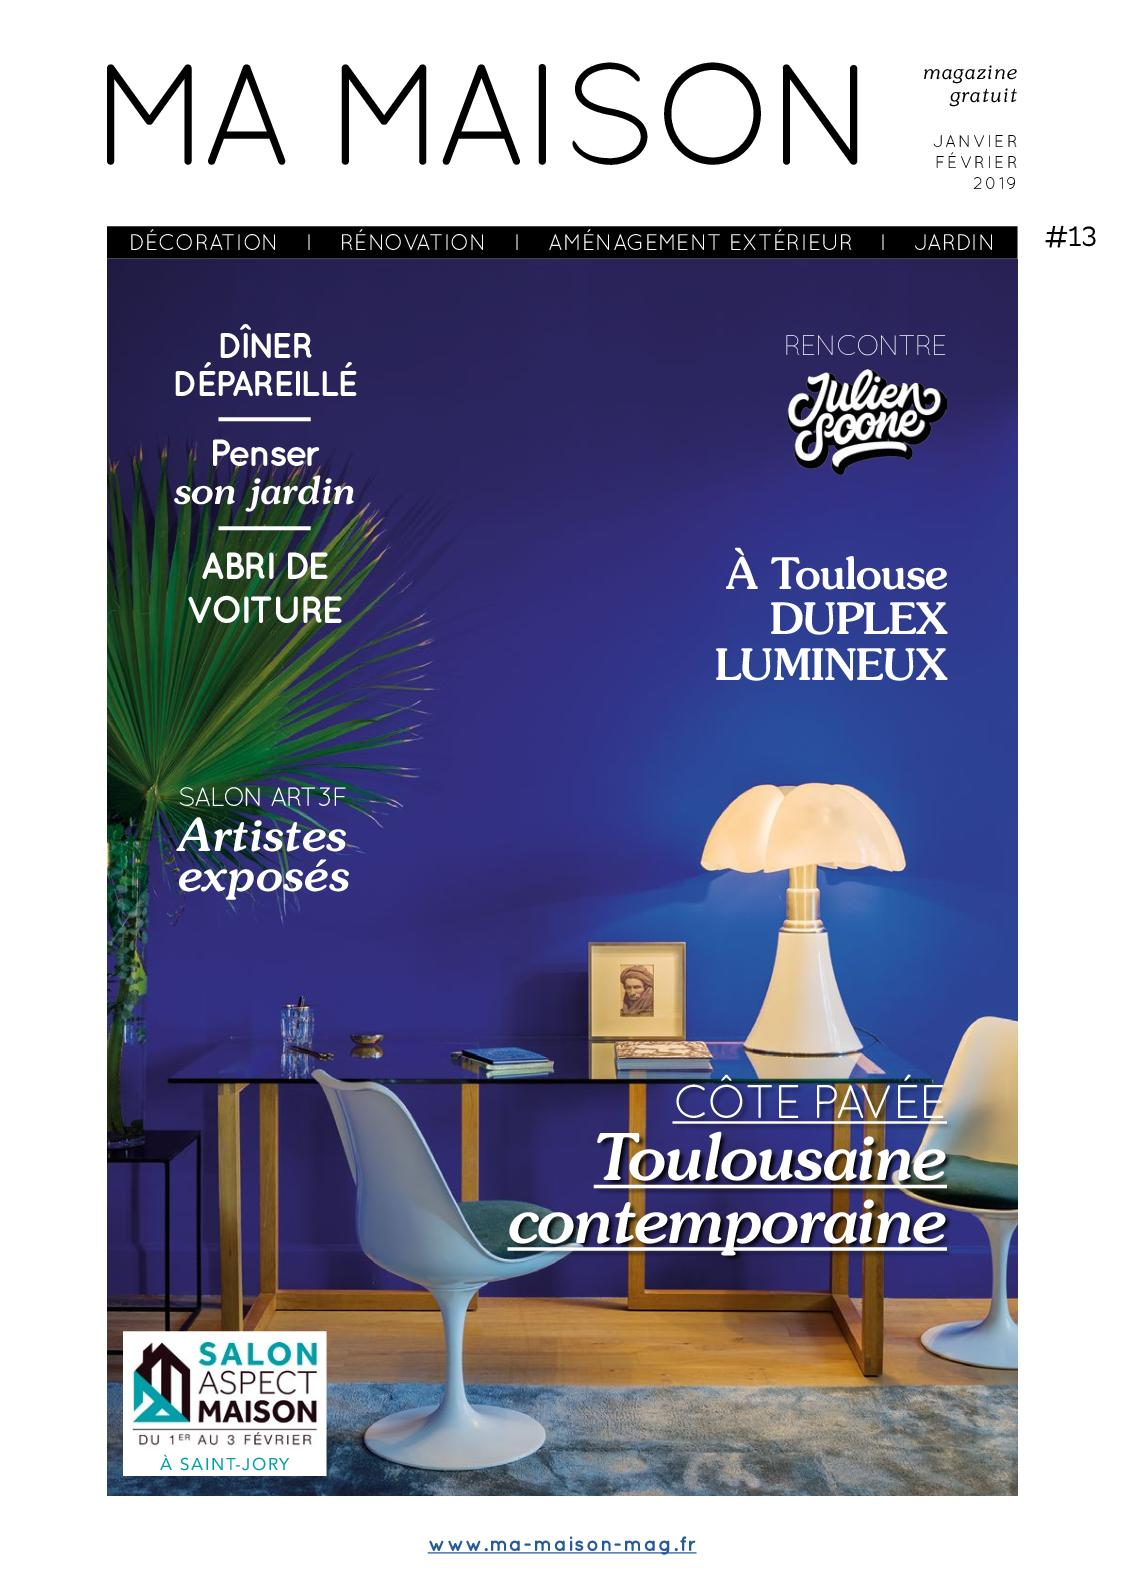 Salon De Jardin Resine Noir Beau Calaméo Ma Maison Magazine Gratuit Numero 13 Of 37 Unique Salon De Jardin Resine Noir